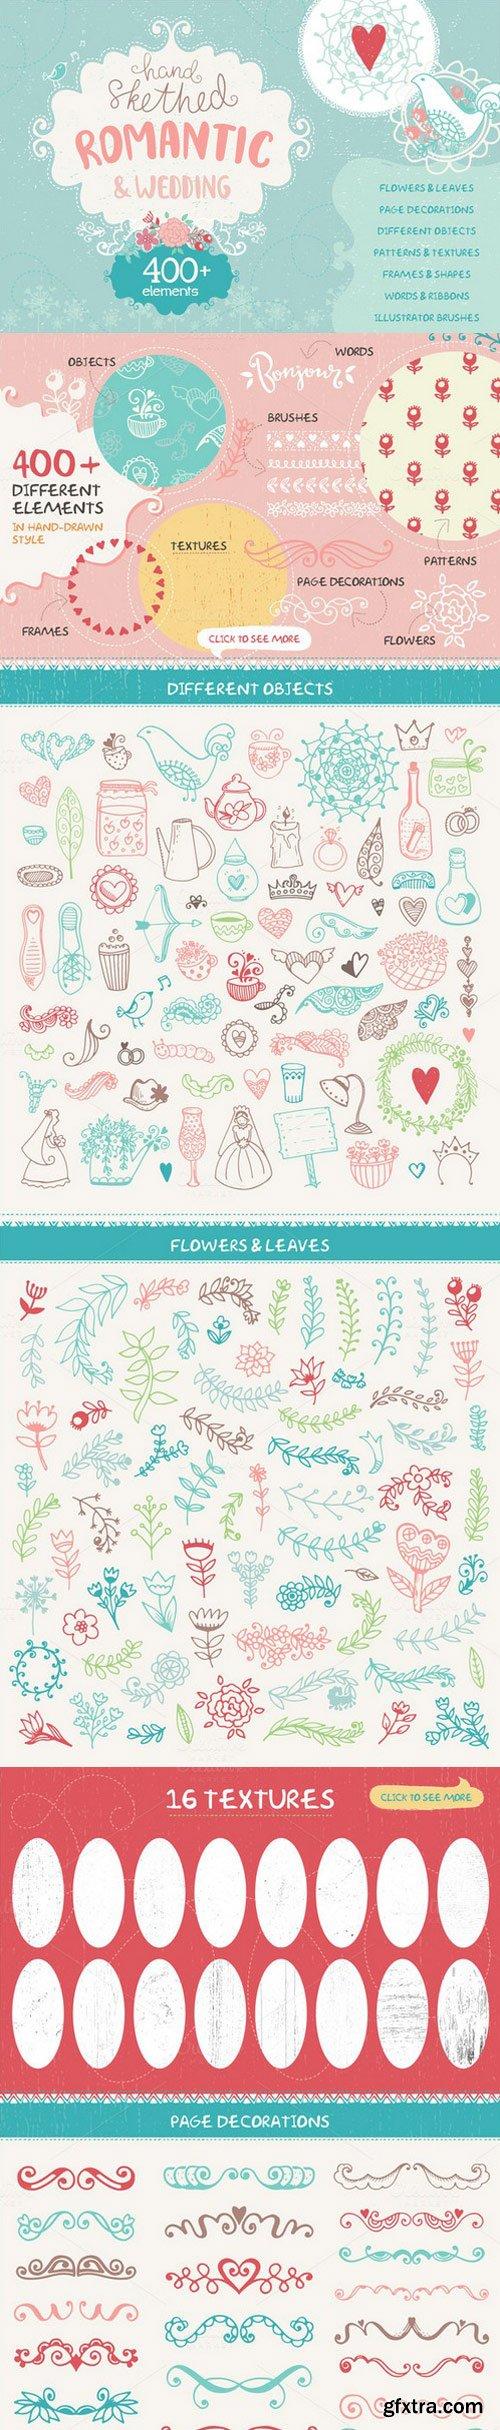 CM - Romantic & Wedding Hand Drawn Set 691316